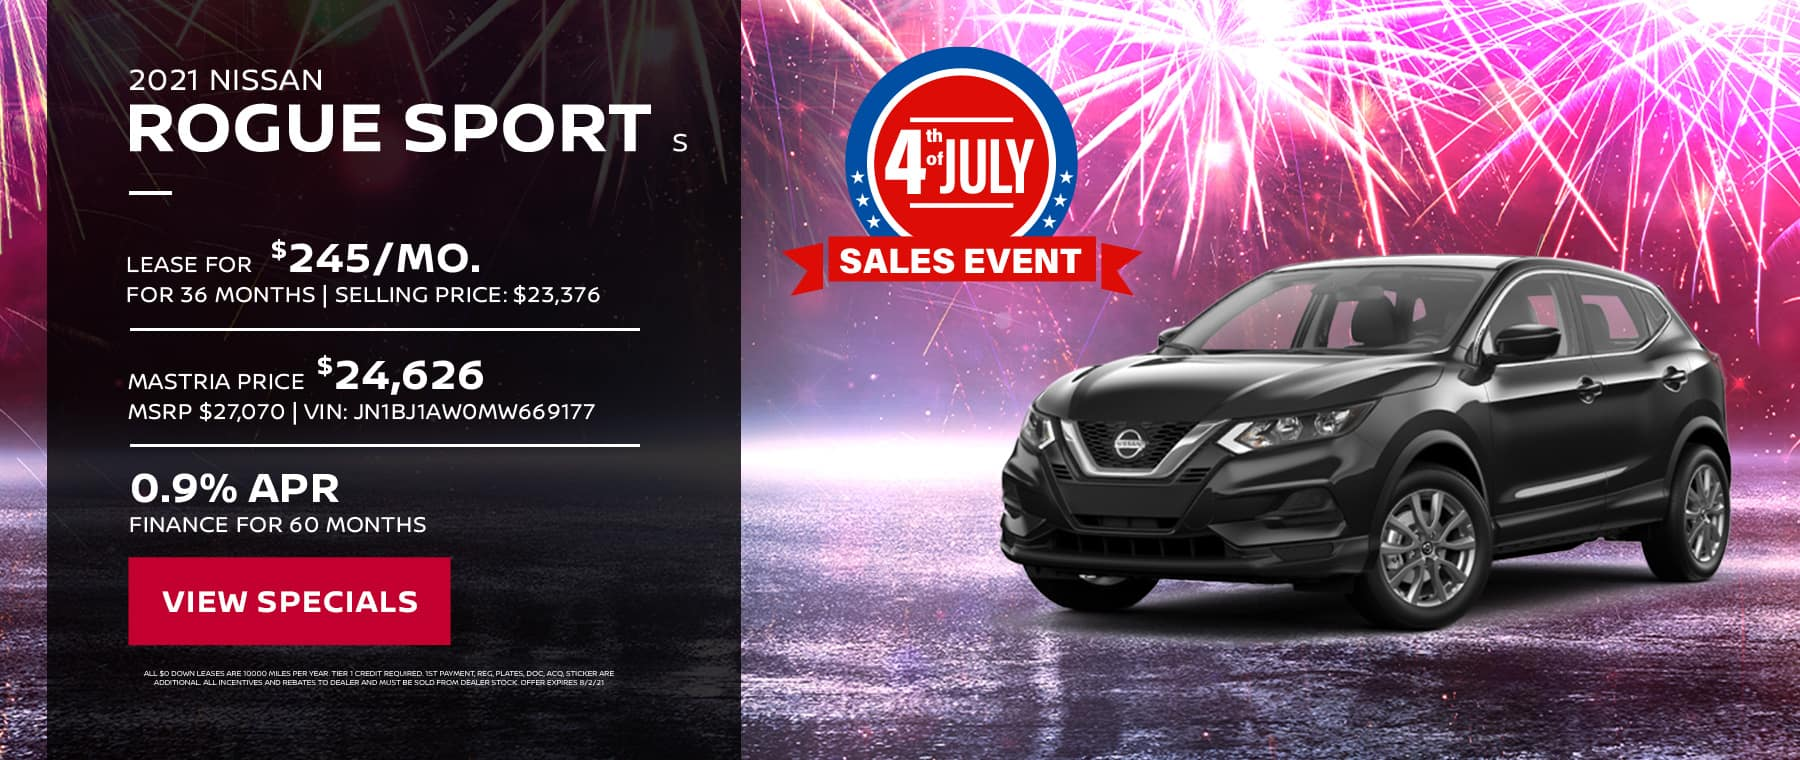 2021-rogue sport-july-21